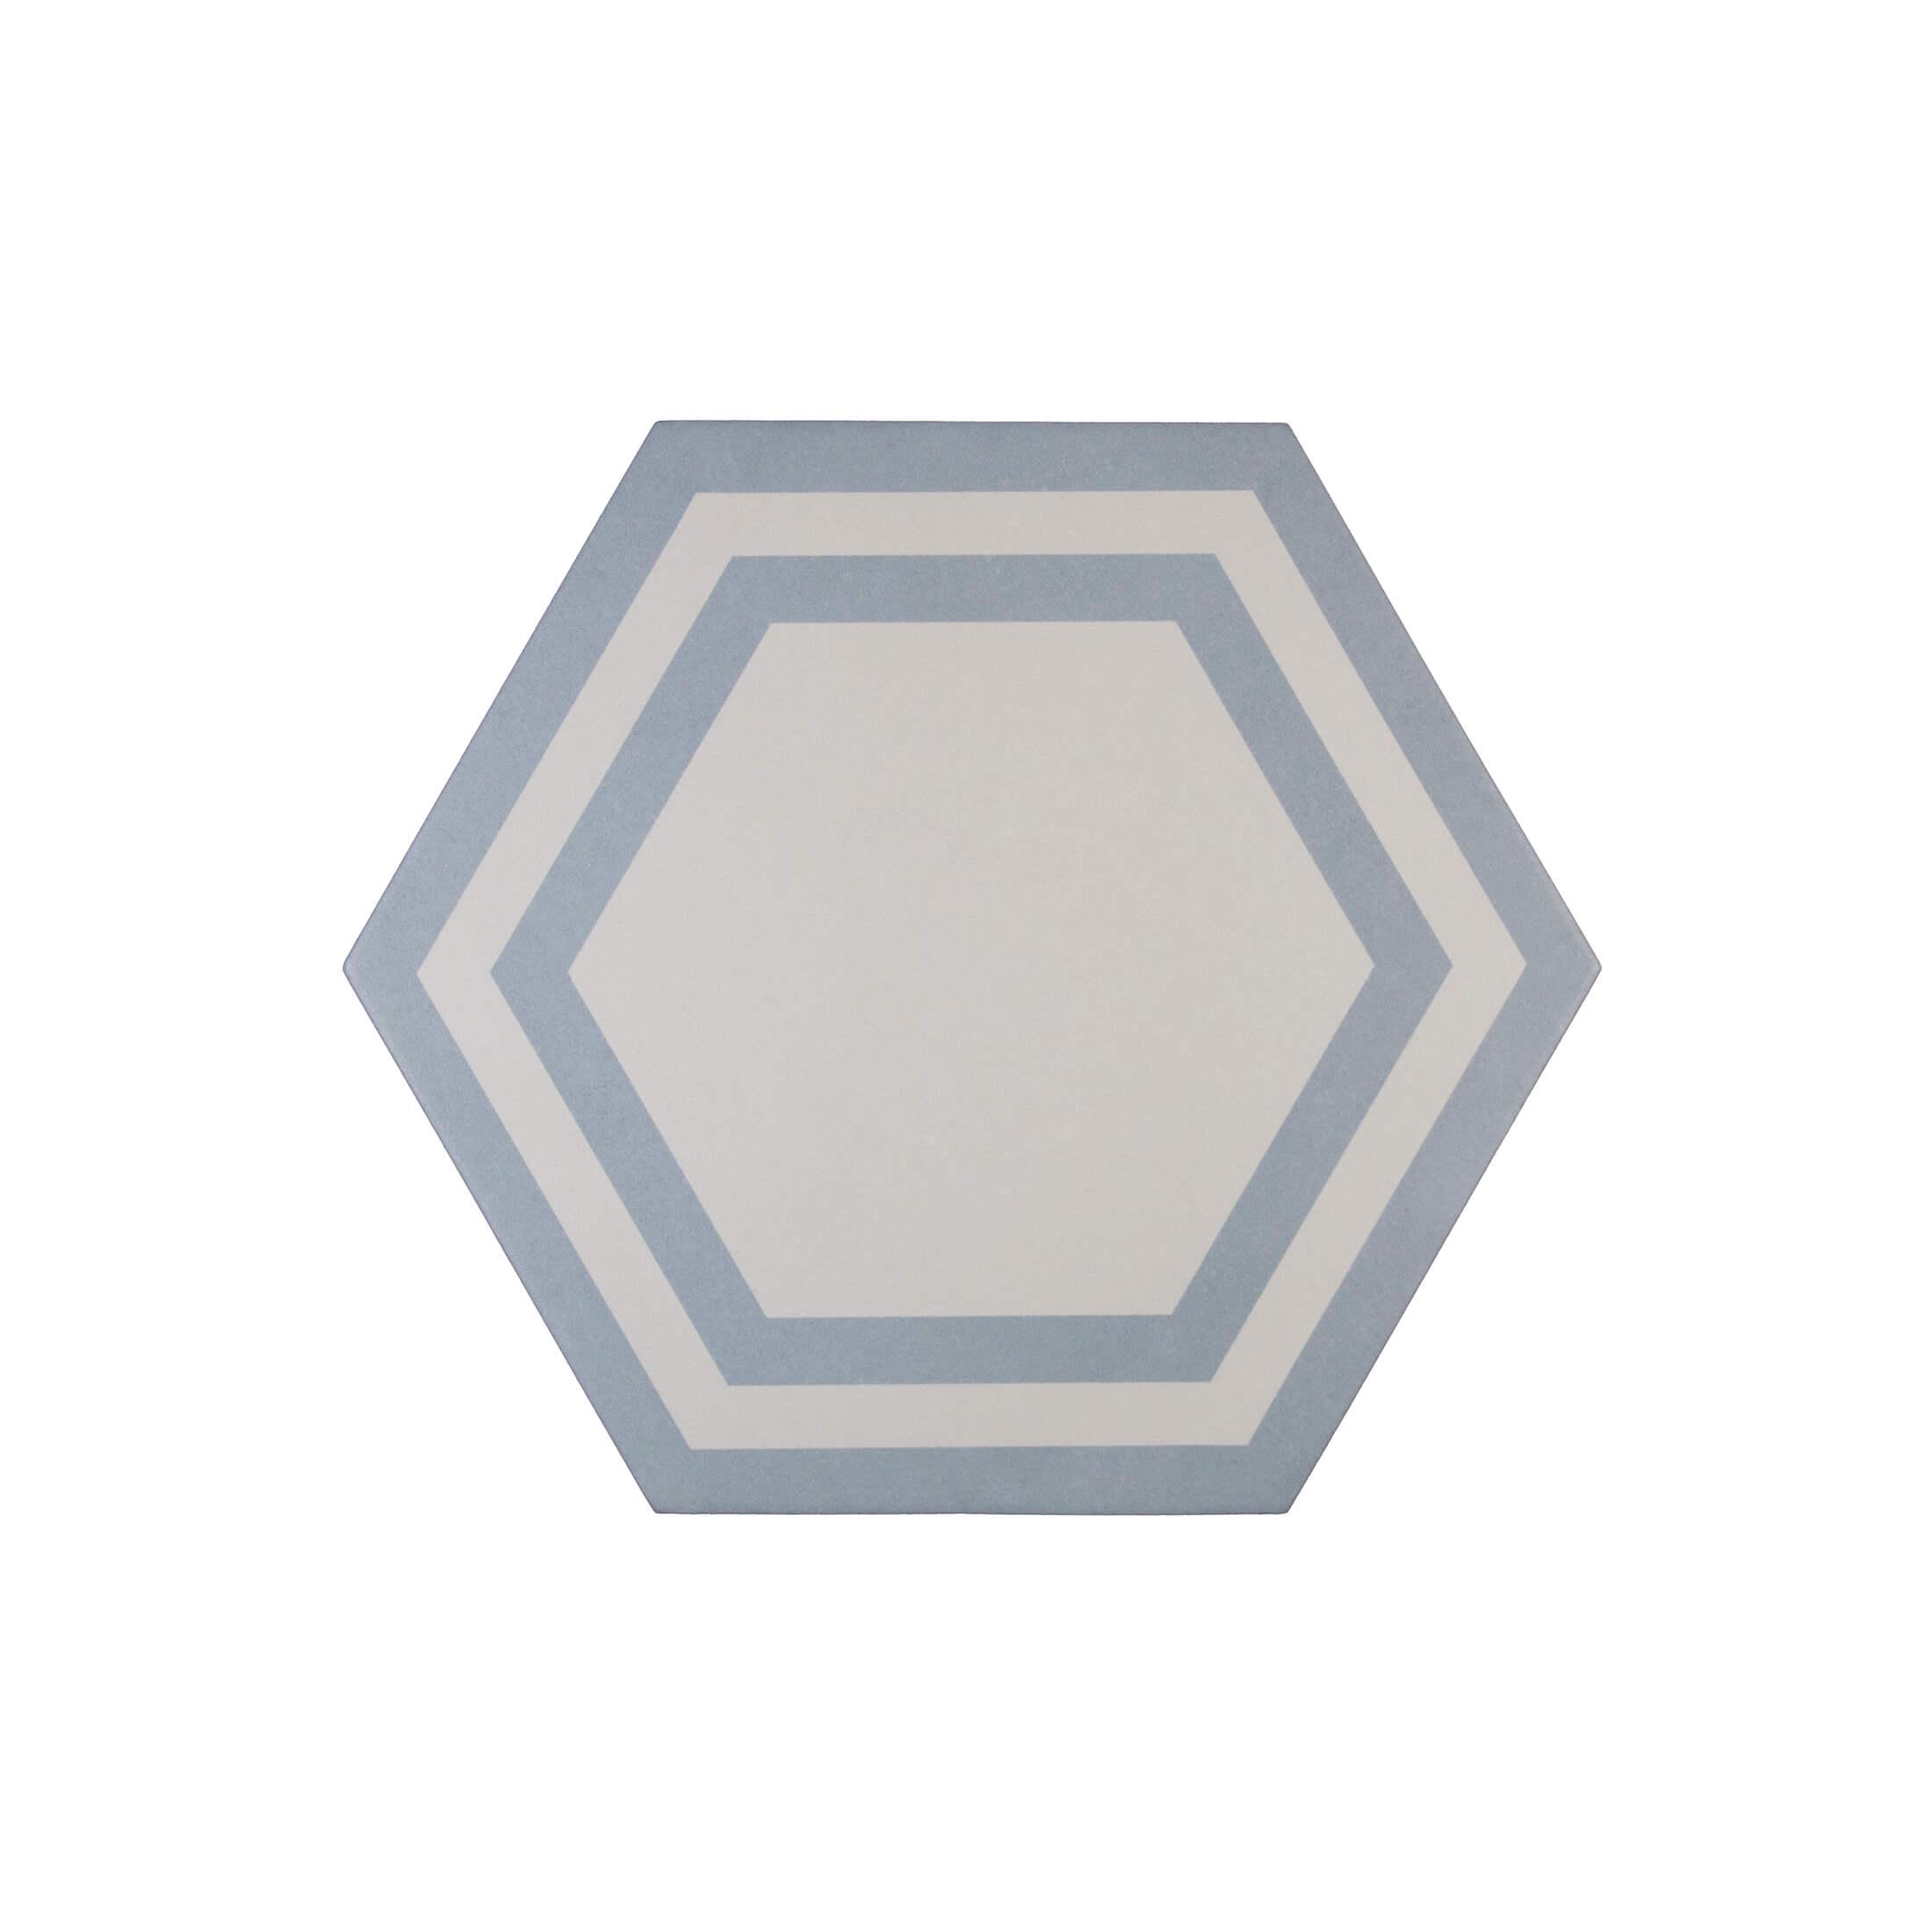 ADPV9021 - PAVIMENTO DECO AZURE - 20 cm X 2,3 cm